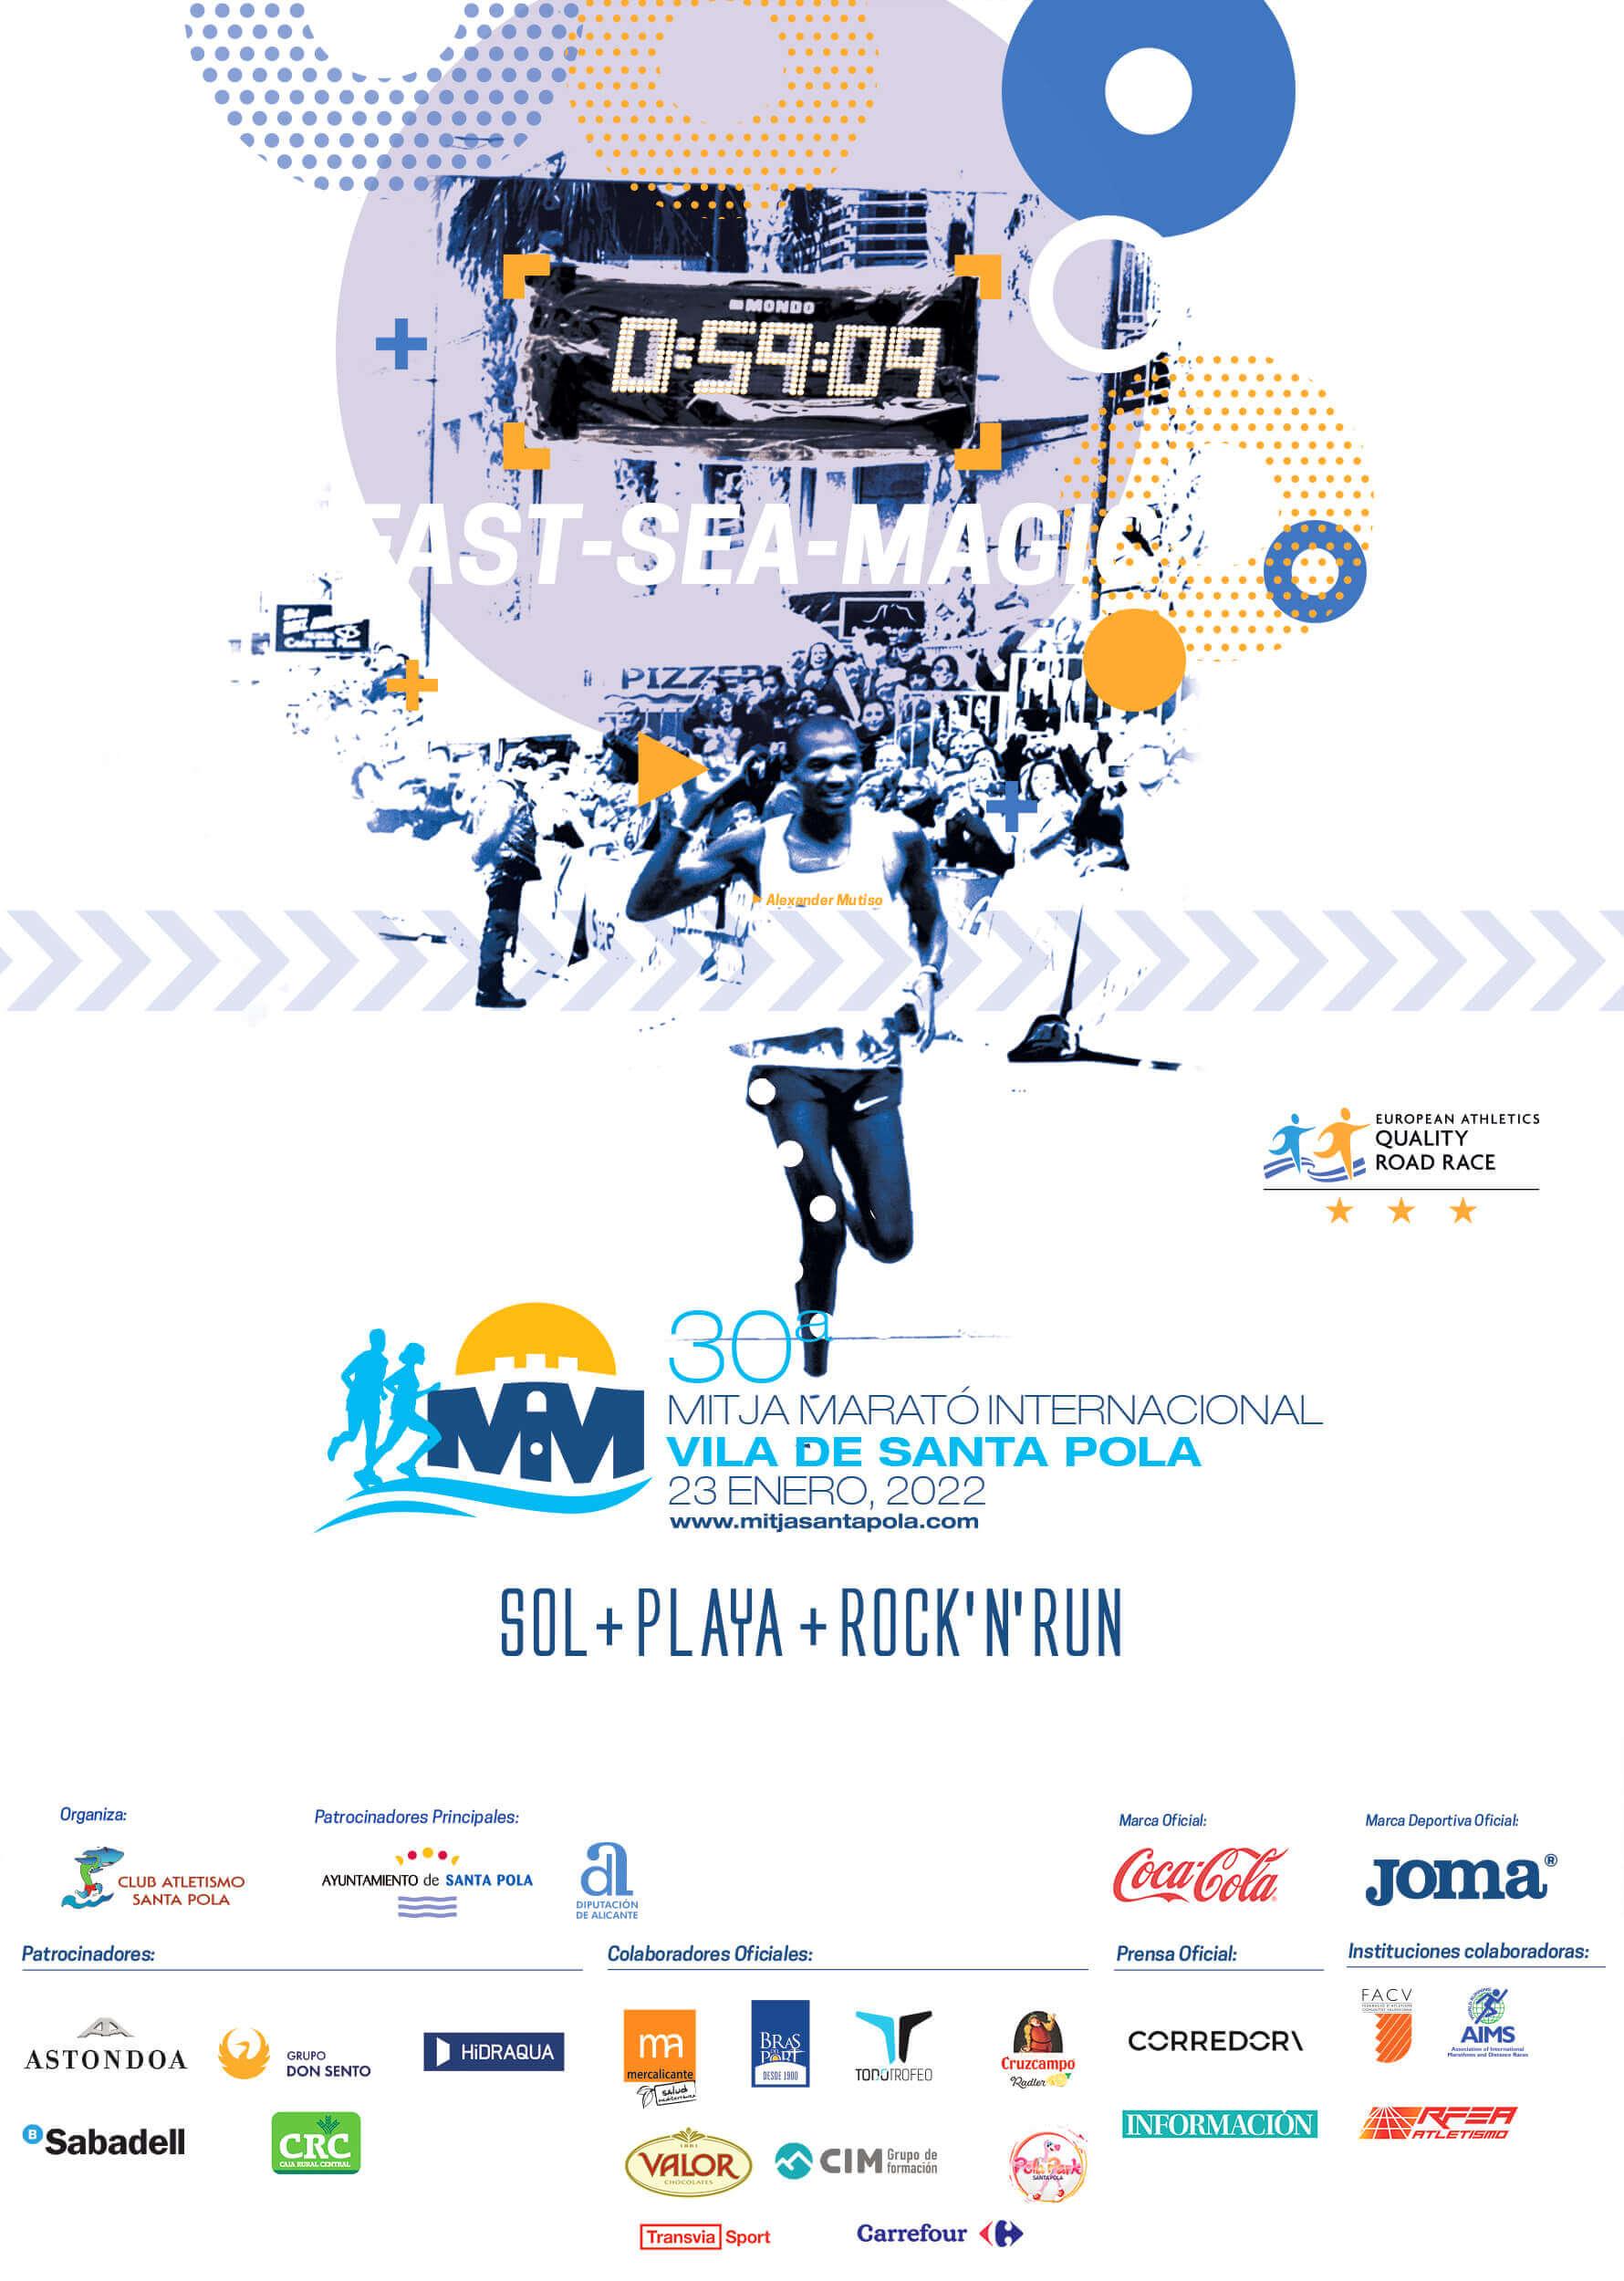 30 Mitja Marató Internacional Vila de Santa Pola